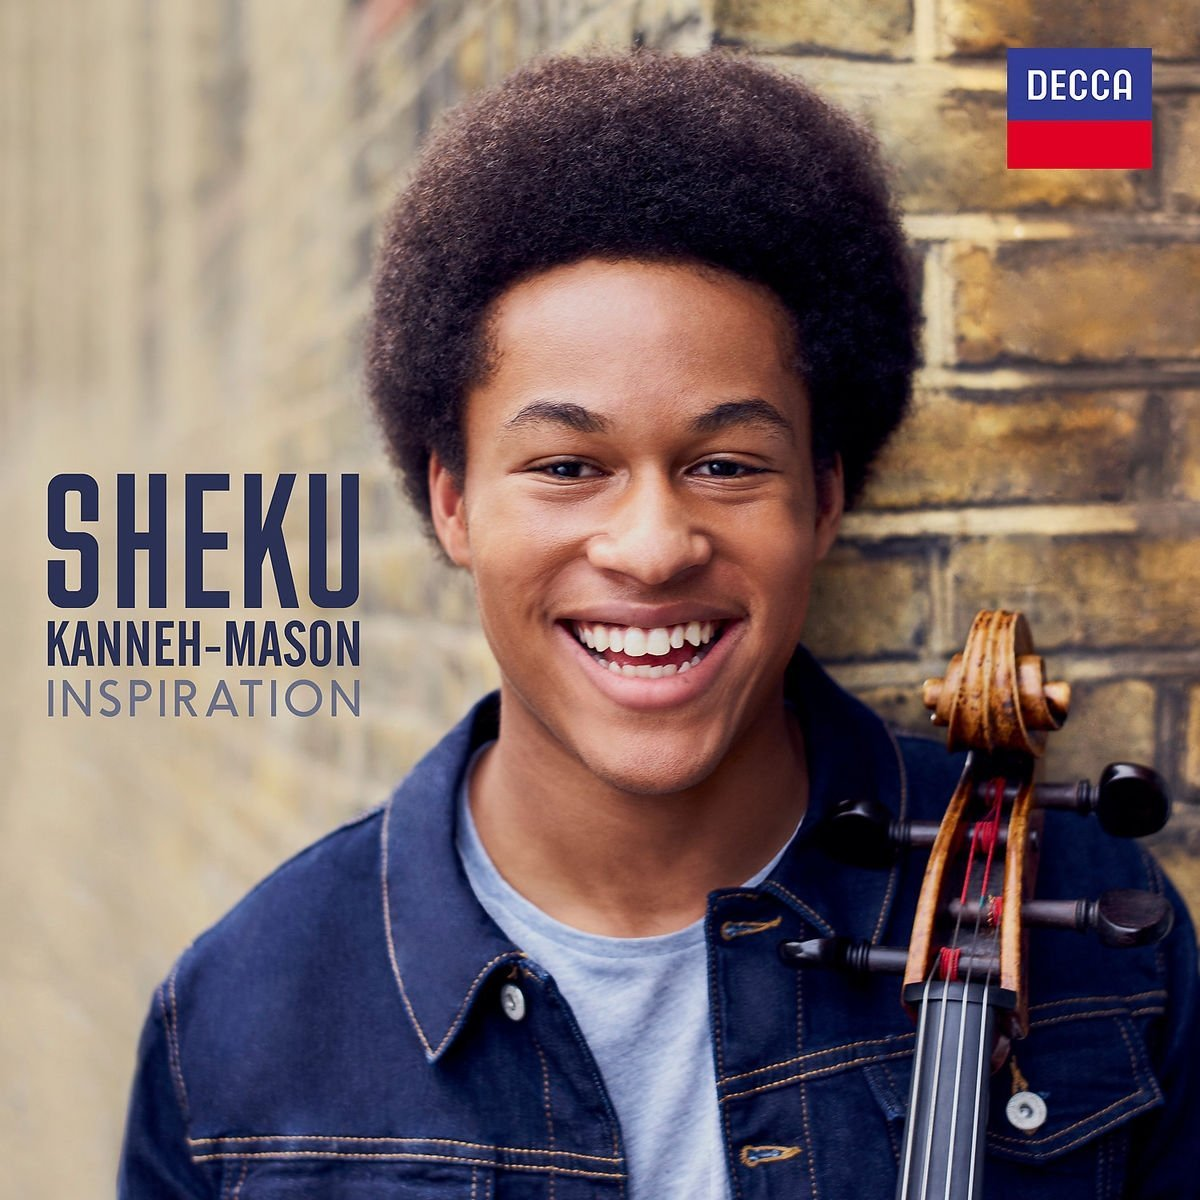 Inspiration: Shekku Kanneh-Mason  Decca